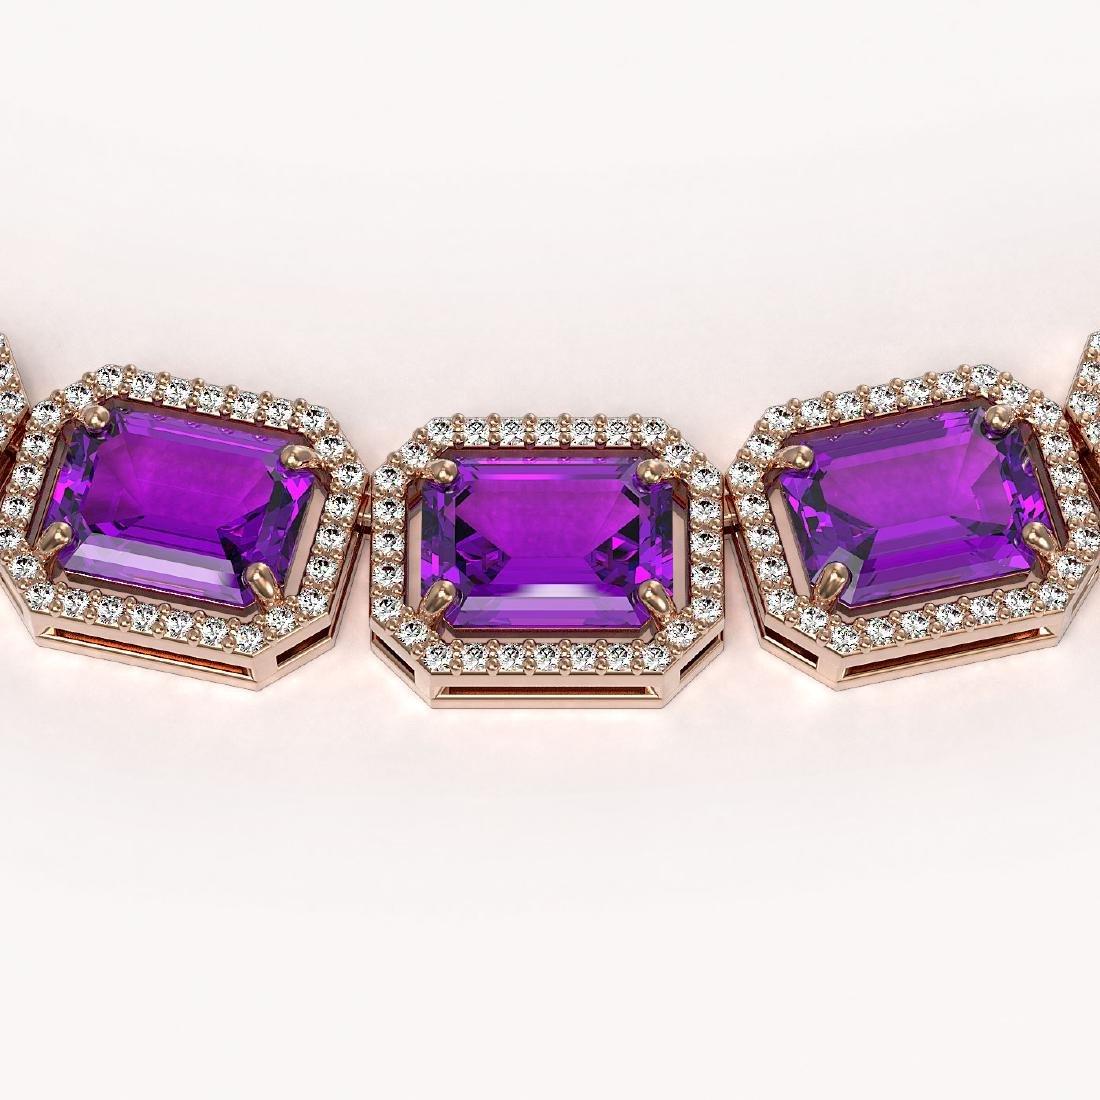 76.69 CTW Amethyst & Diamond Halo Necklace 10K Rose - 2